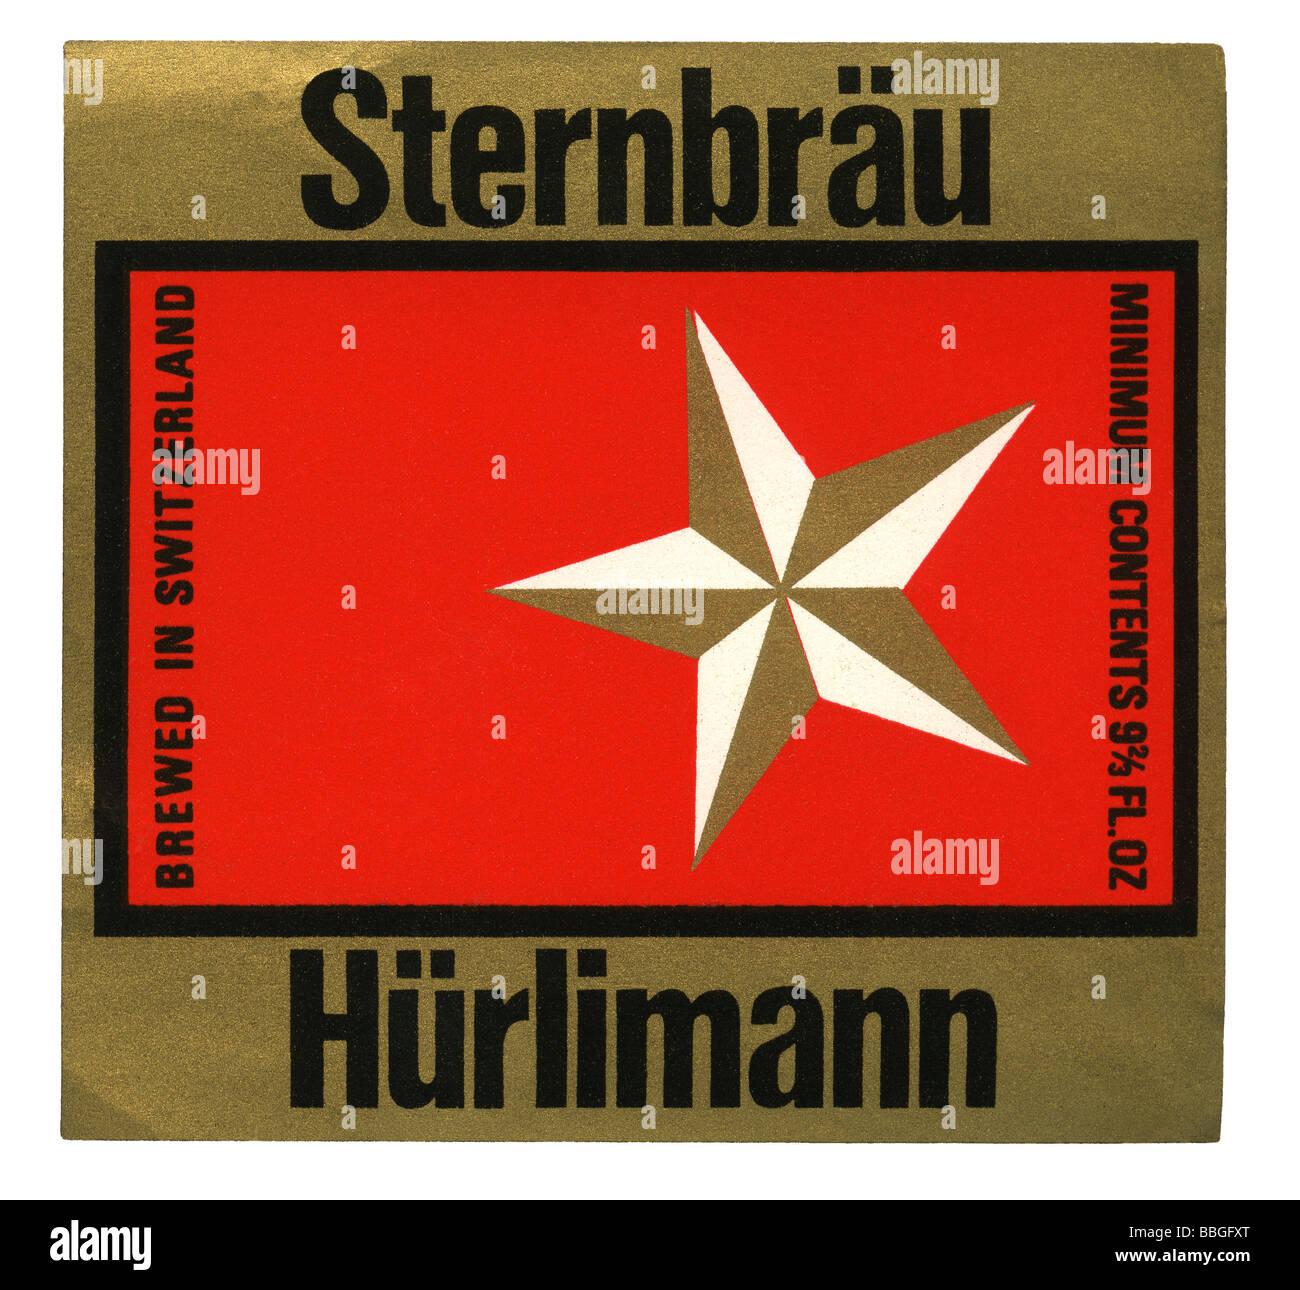 Old beer label for Hurlimann's Sternbrau, Zurich, Switzerland - Stock Image